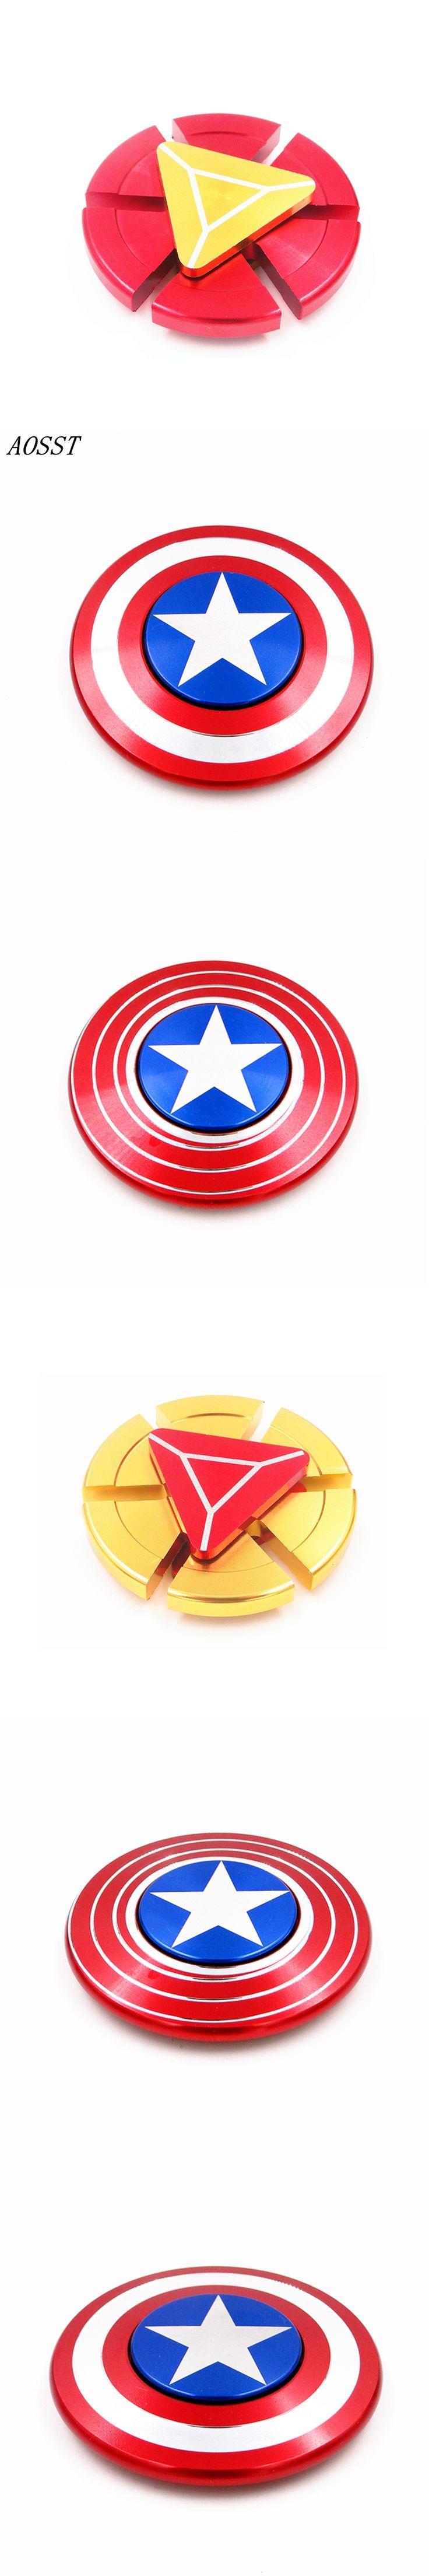 (AOSST) High-quality Captain America Shield Metal Hand Spinner Fidget Toys Spinner Finger Spinner Stress Wheel For ADD And ADHD